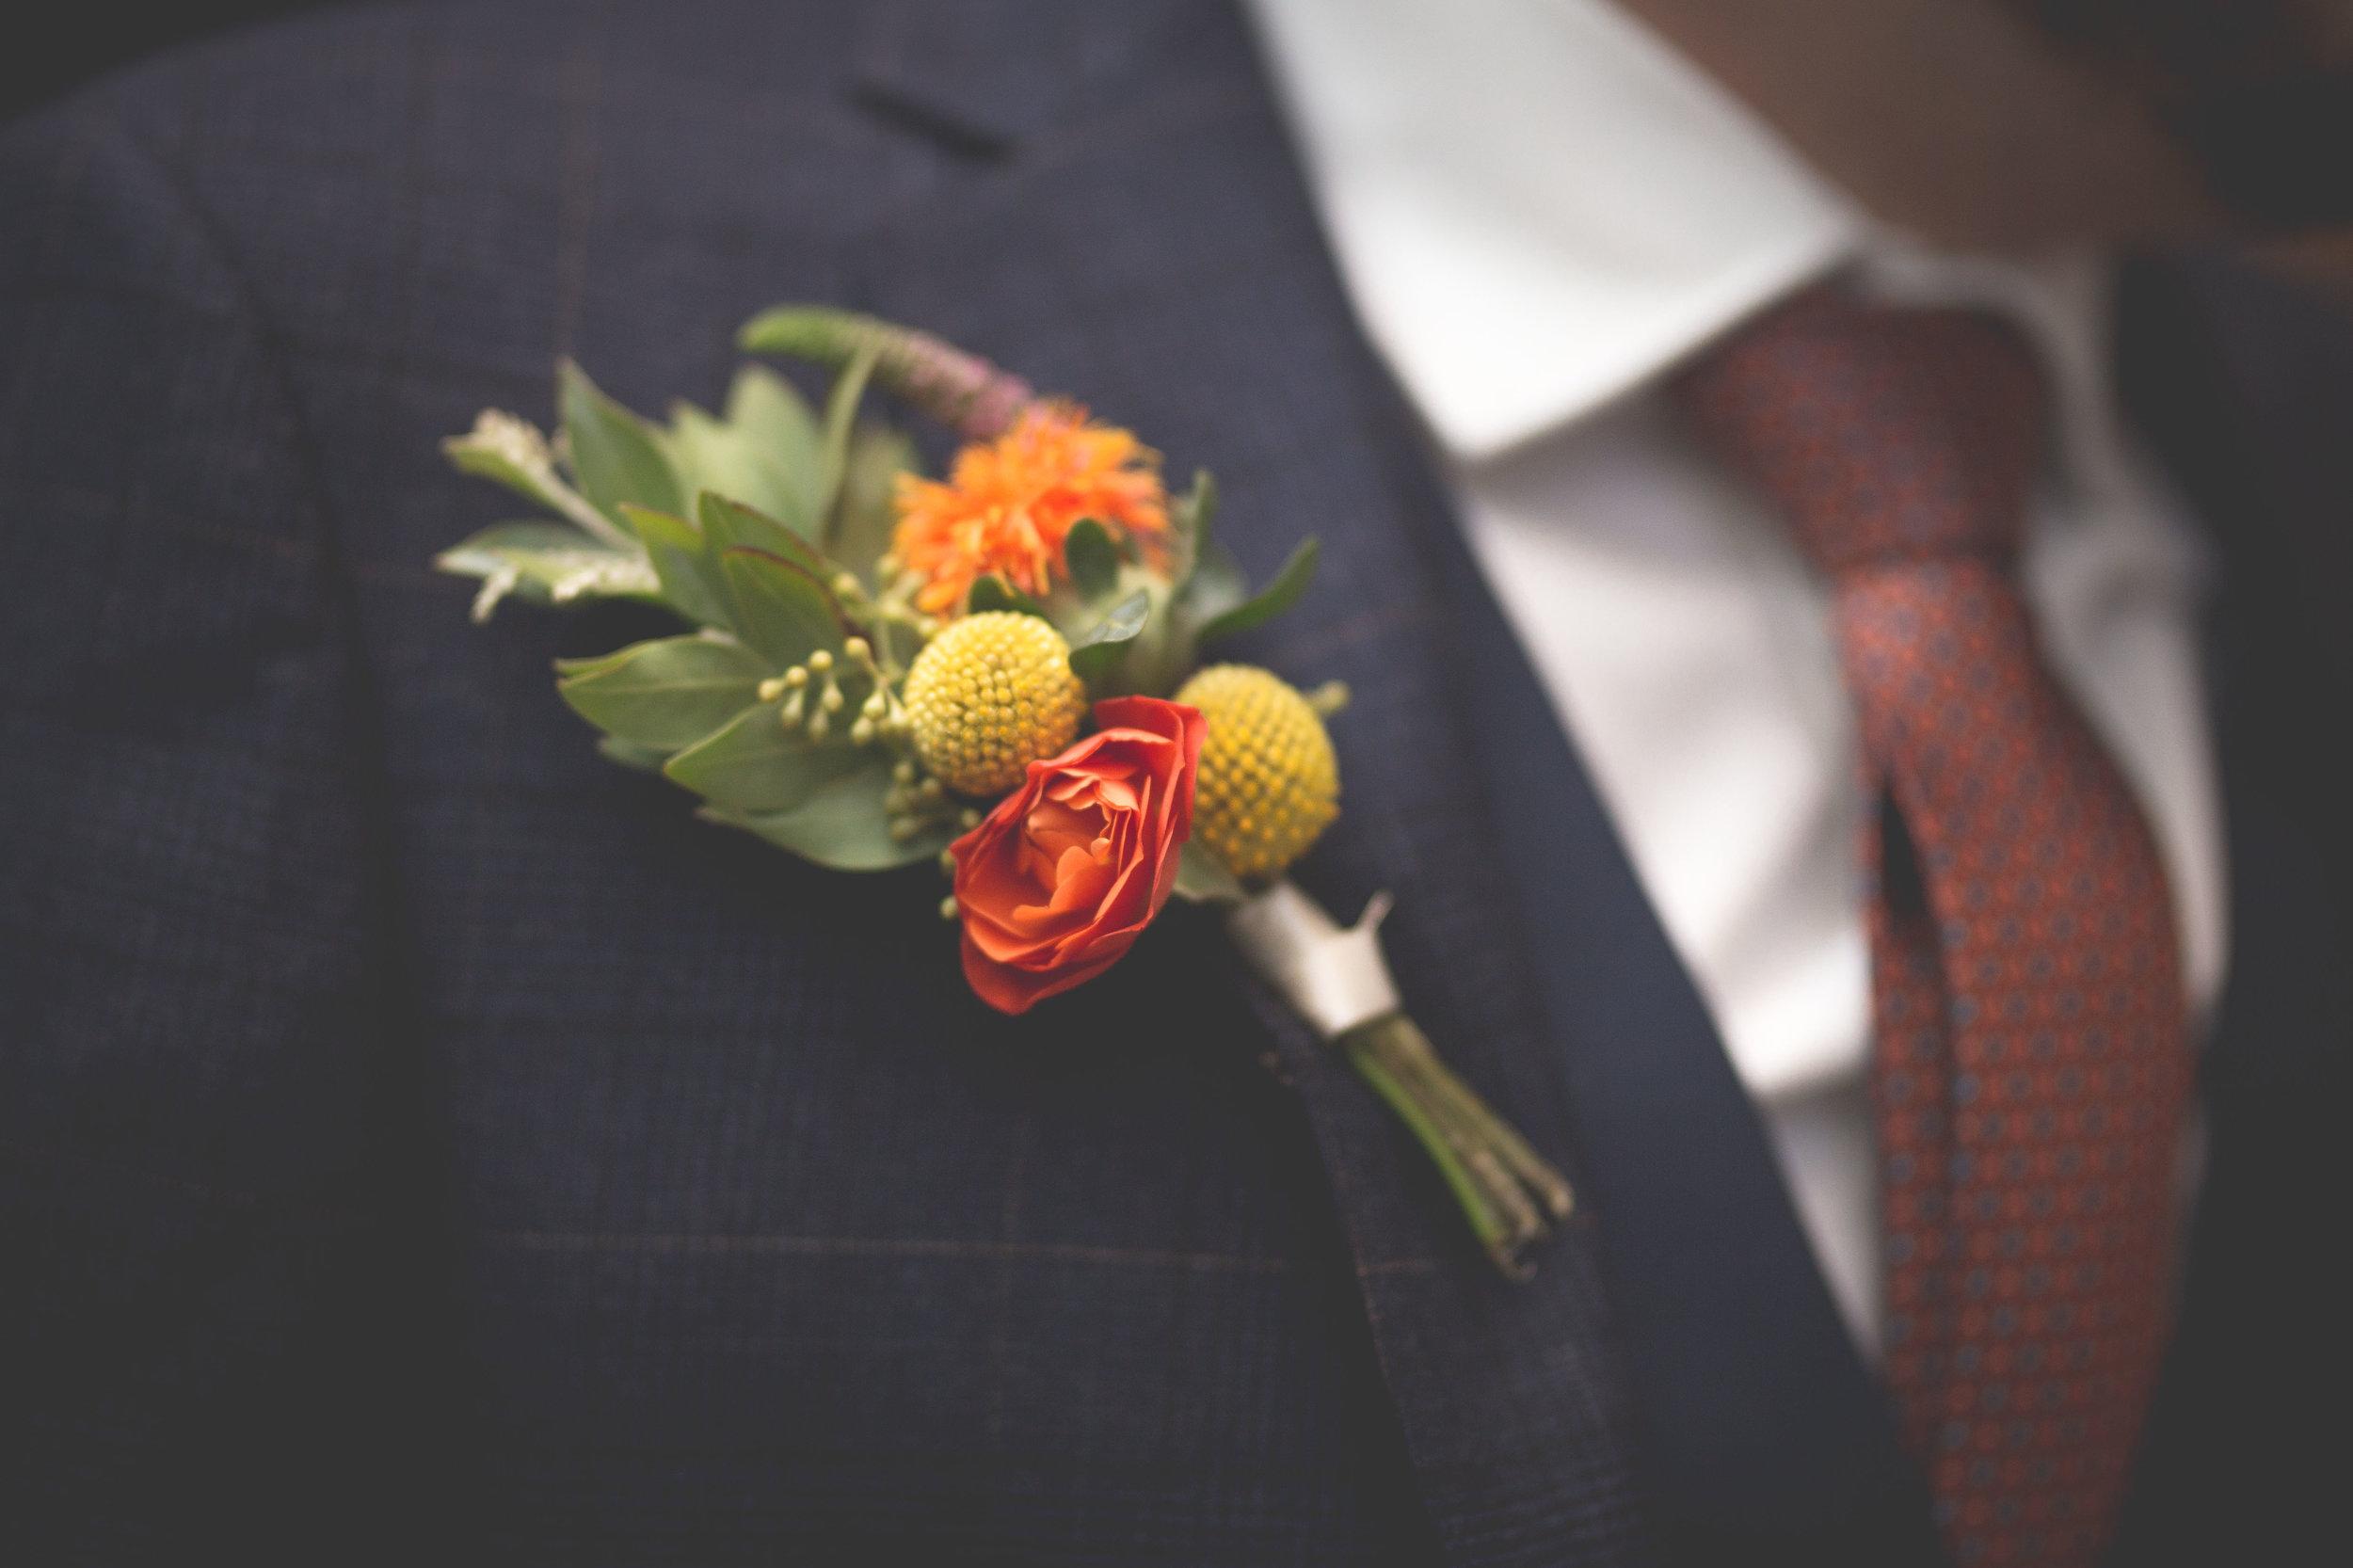 Northern Ireland Wedding Photographer | Brian McEwan Photography | Affordable Wedding Photography Throughout Antrim Down Armagh Tyrone Londonderry Derry Down Fermanagh -31.jpg